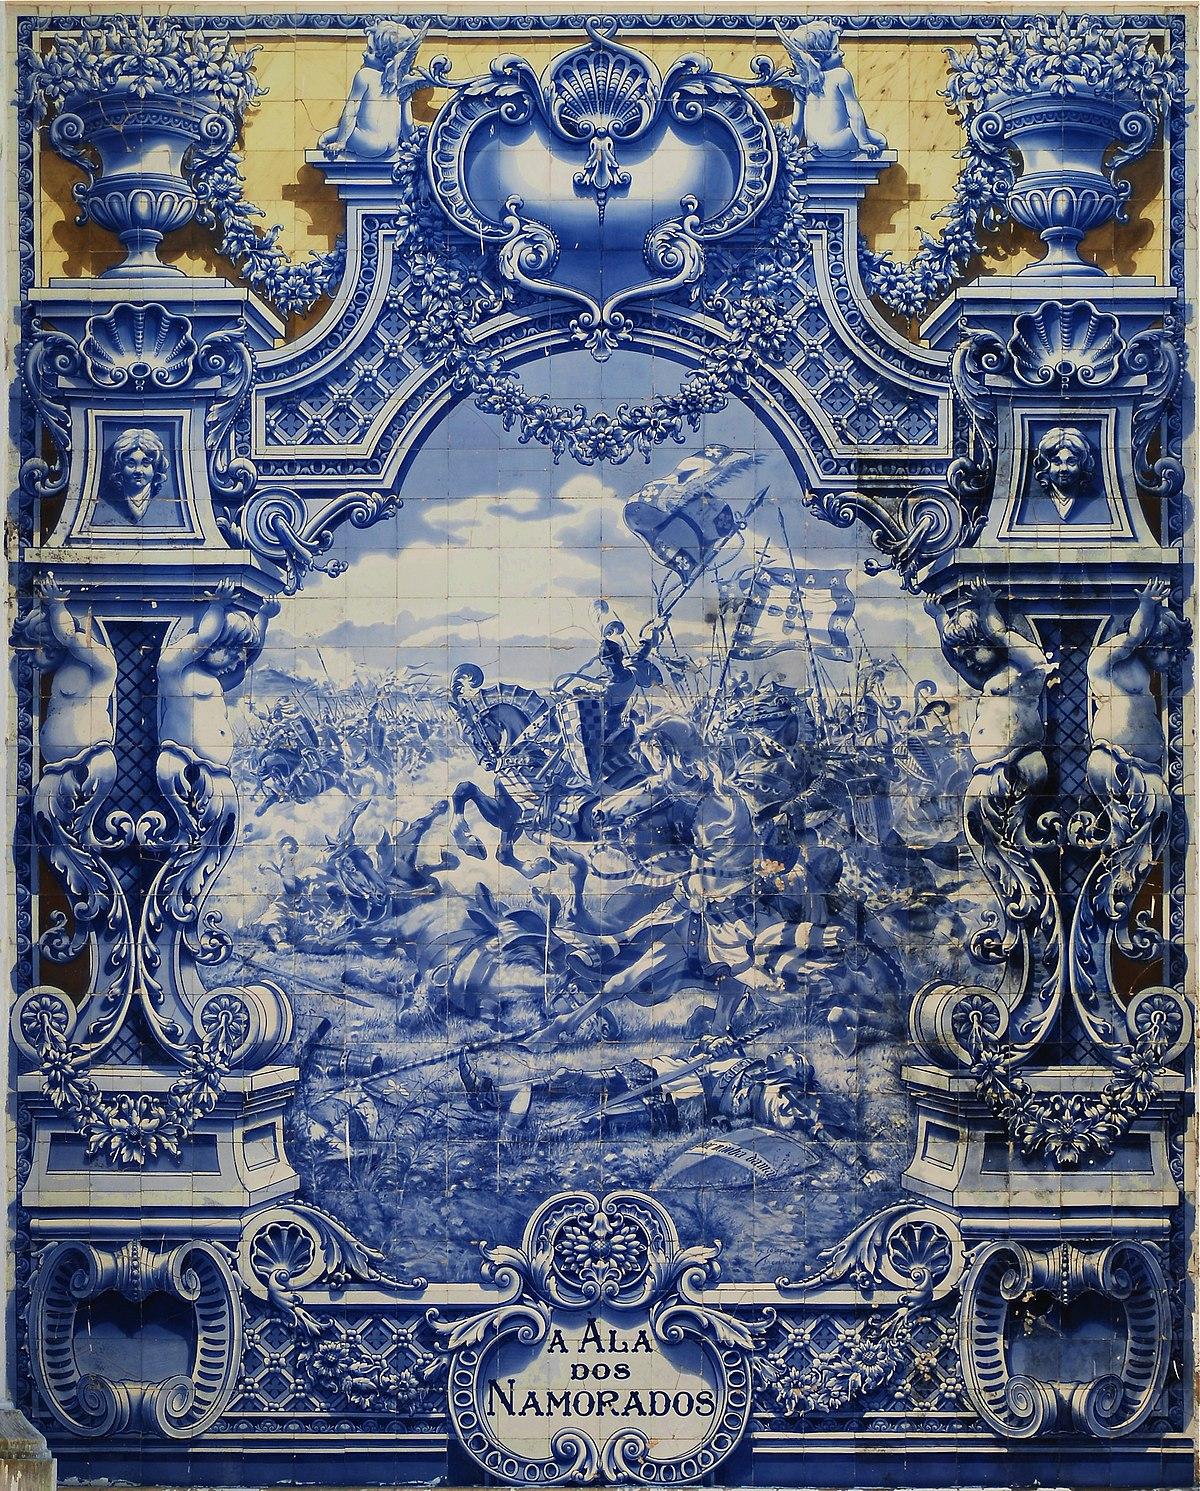 Azulejo wikip dia a enciclop dia livre - Pintar azulejo ...